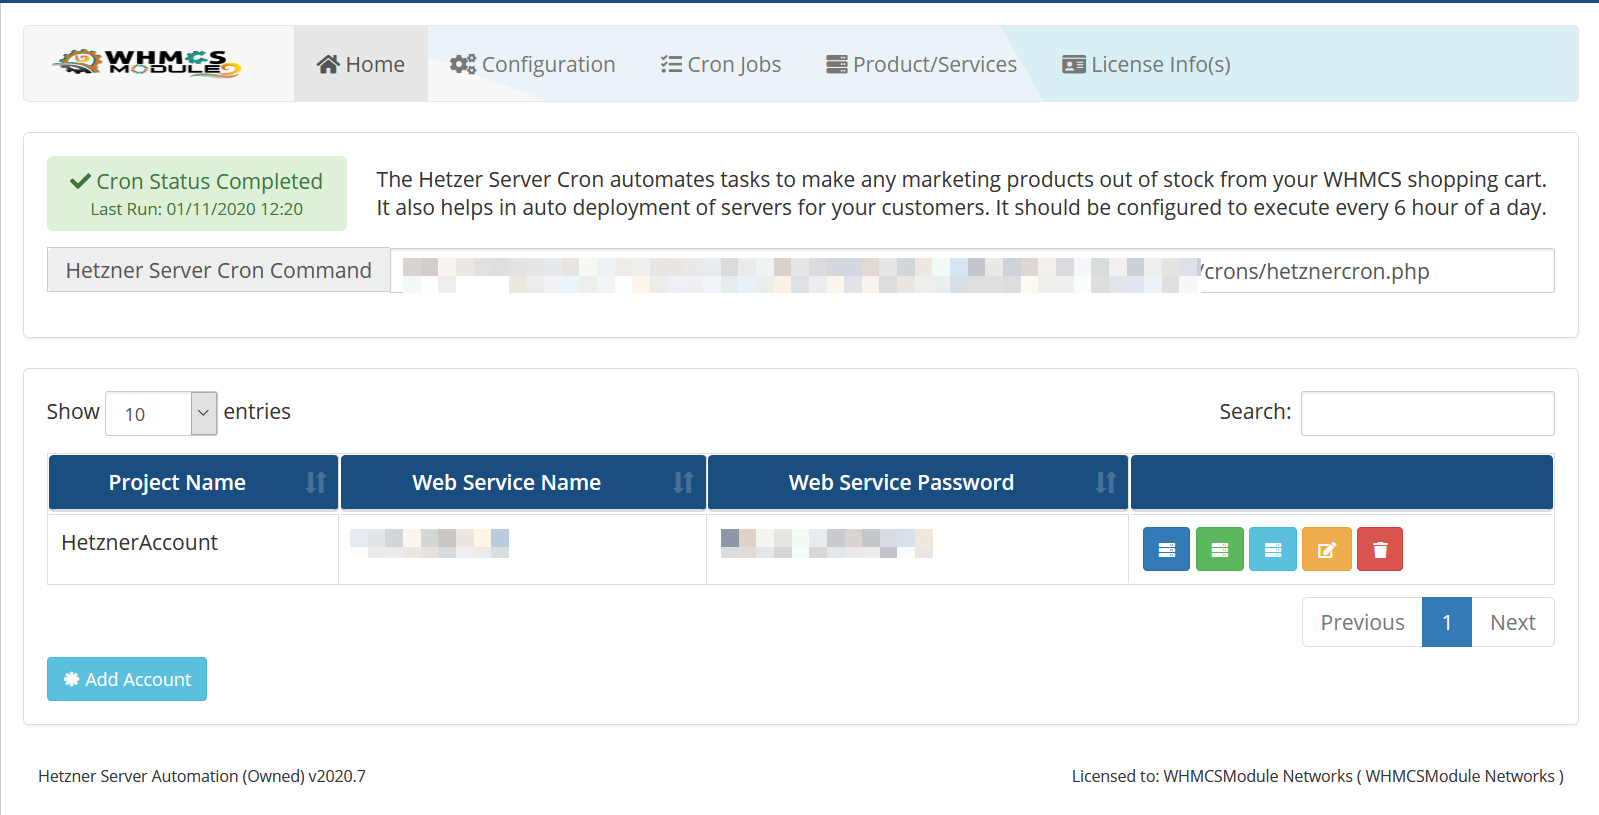 Hetzner Server WHMCS Module